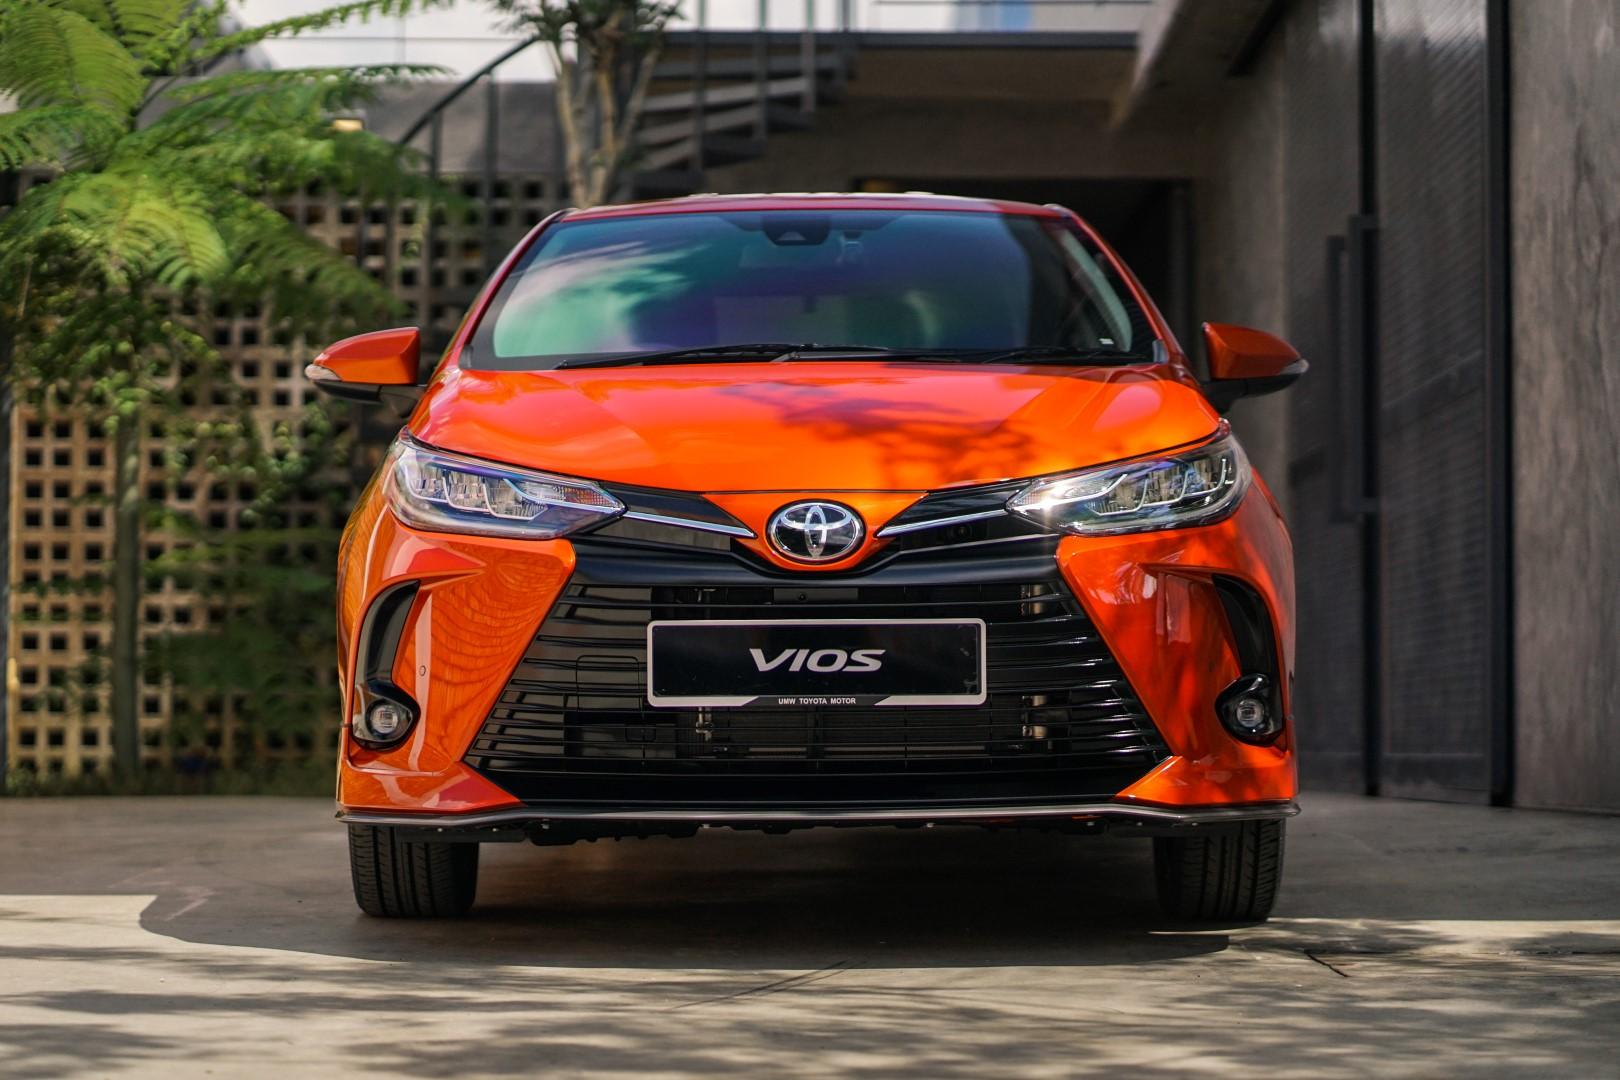 2020 Toyota Vios Facelift